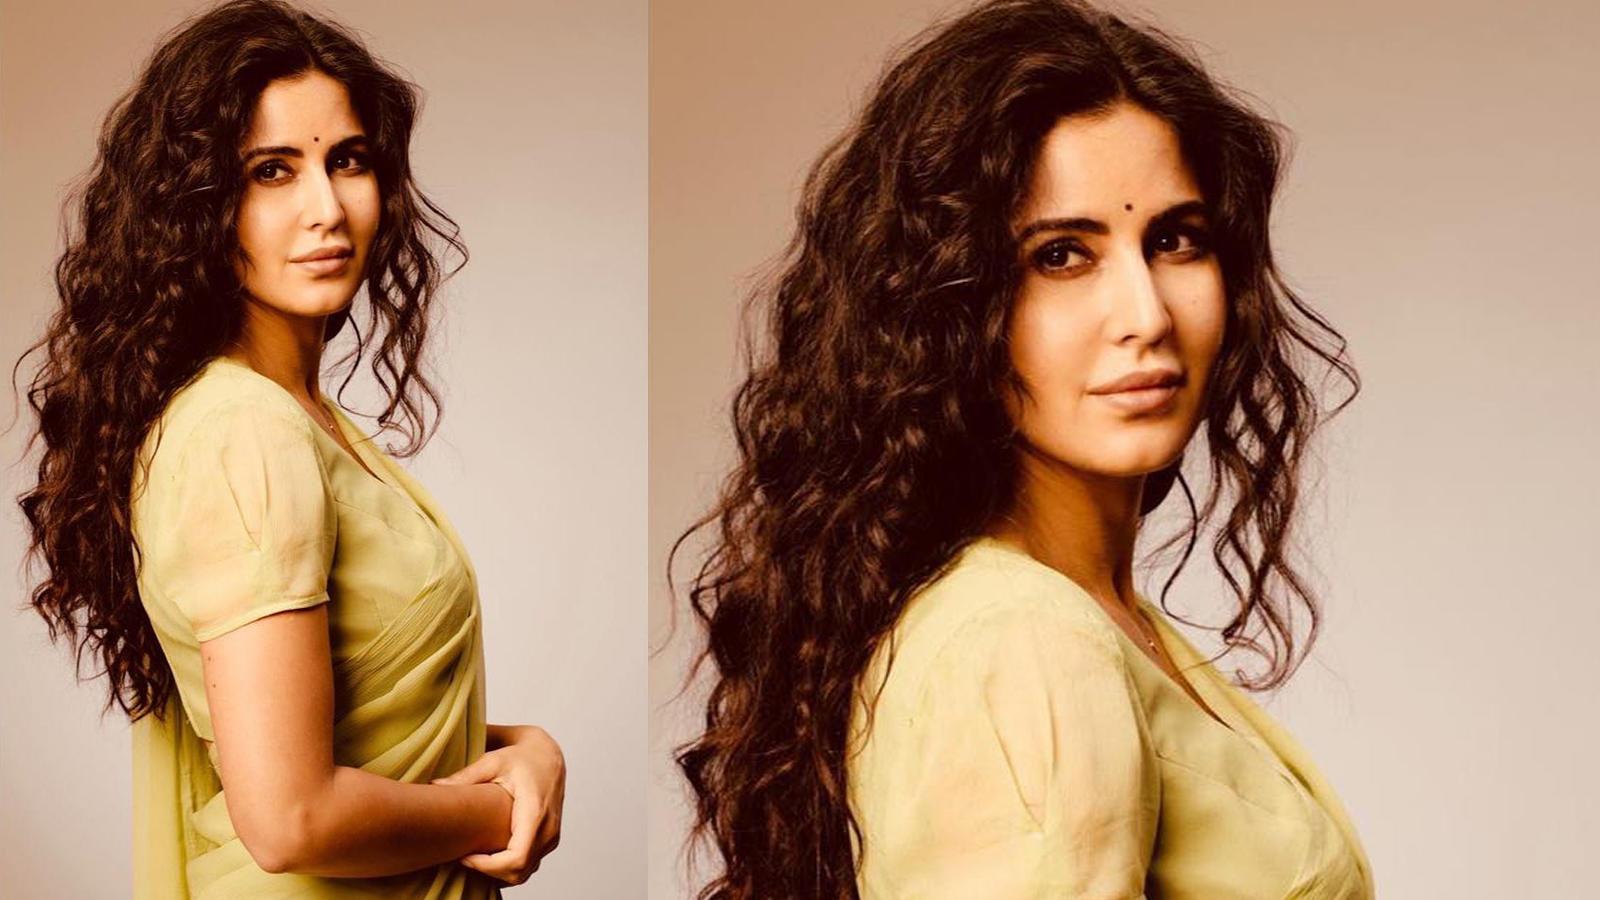 Katrina Kaif Looks Stunning In 'desi Avatar' In New - Salman Khan Bharat , HD Wallpaper & Backgrounds